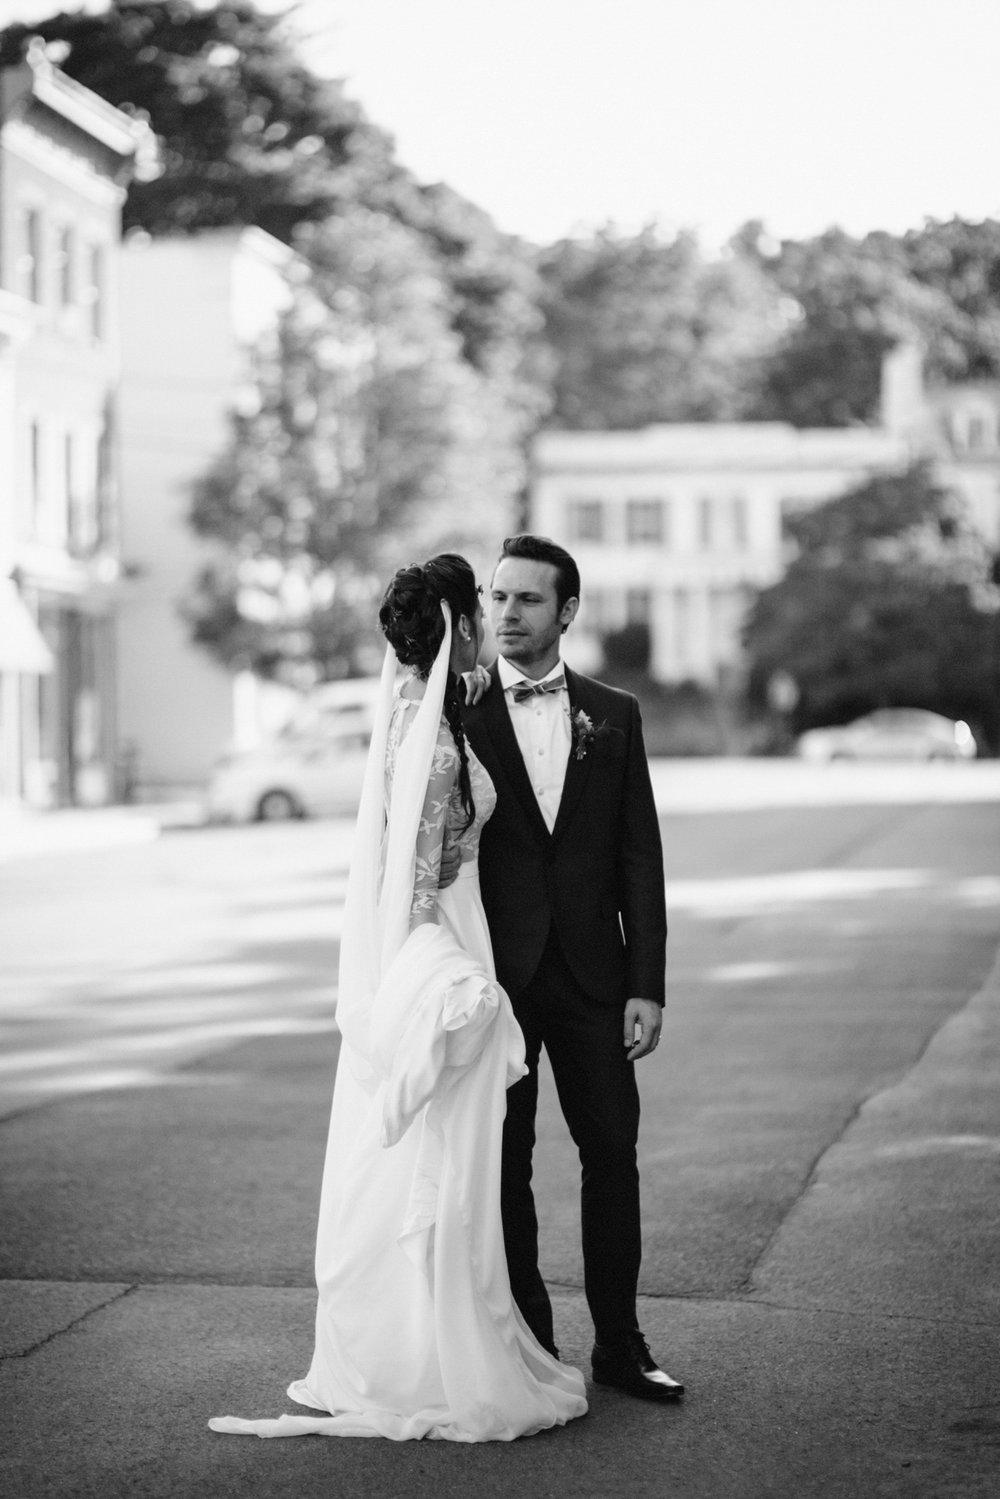 Kimberly-Coccagnia-Wedding-Photographer-171.JPG